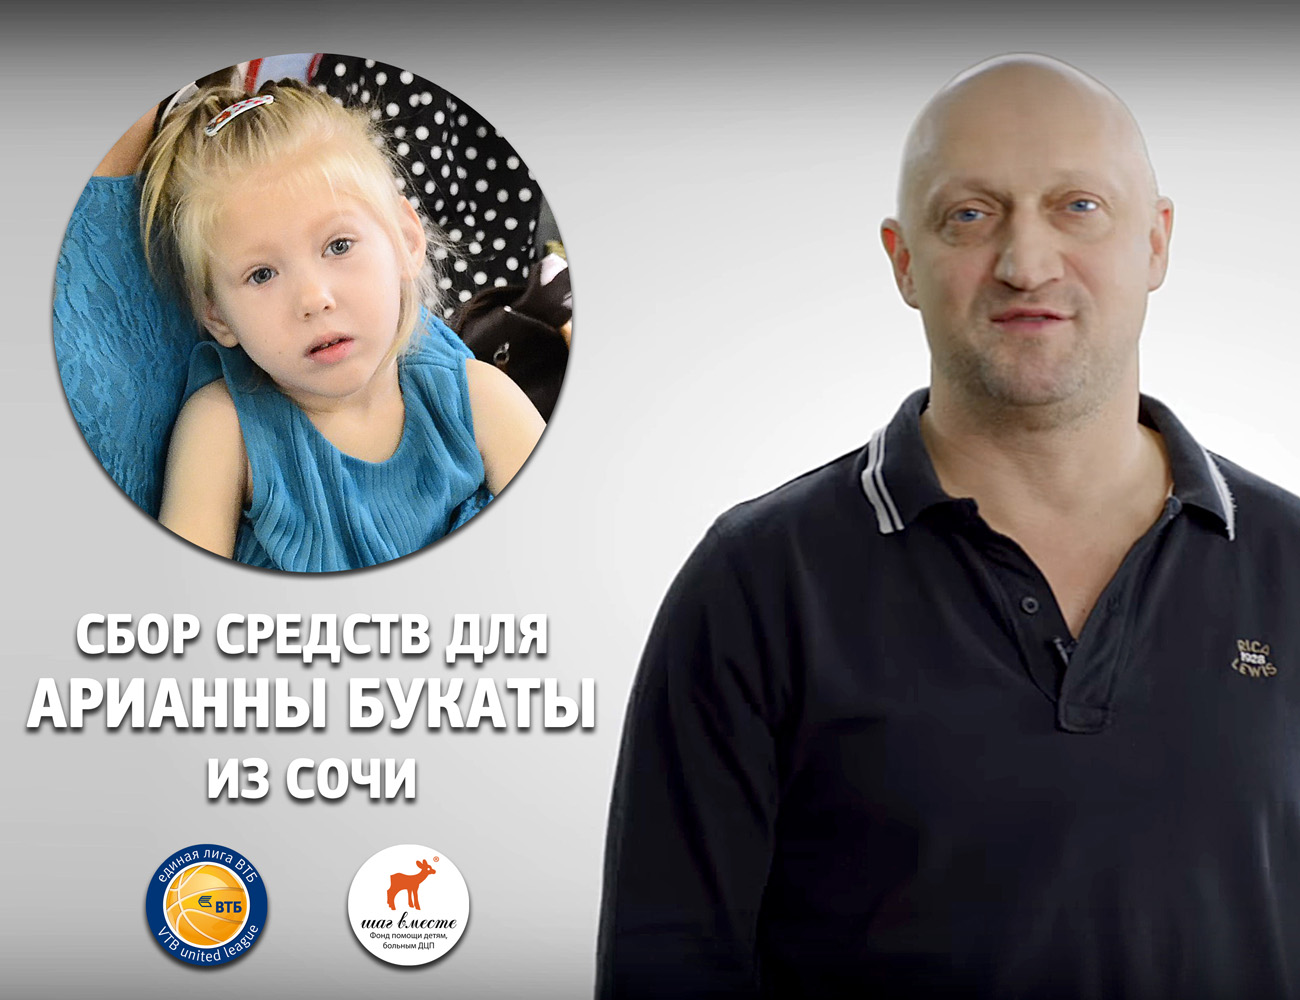 Единая лига ВТБ и фонд Гоши Куценко «Шаг вместе» собирают средства на лечение ребенка в Сочи